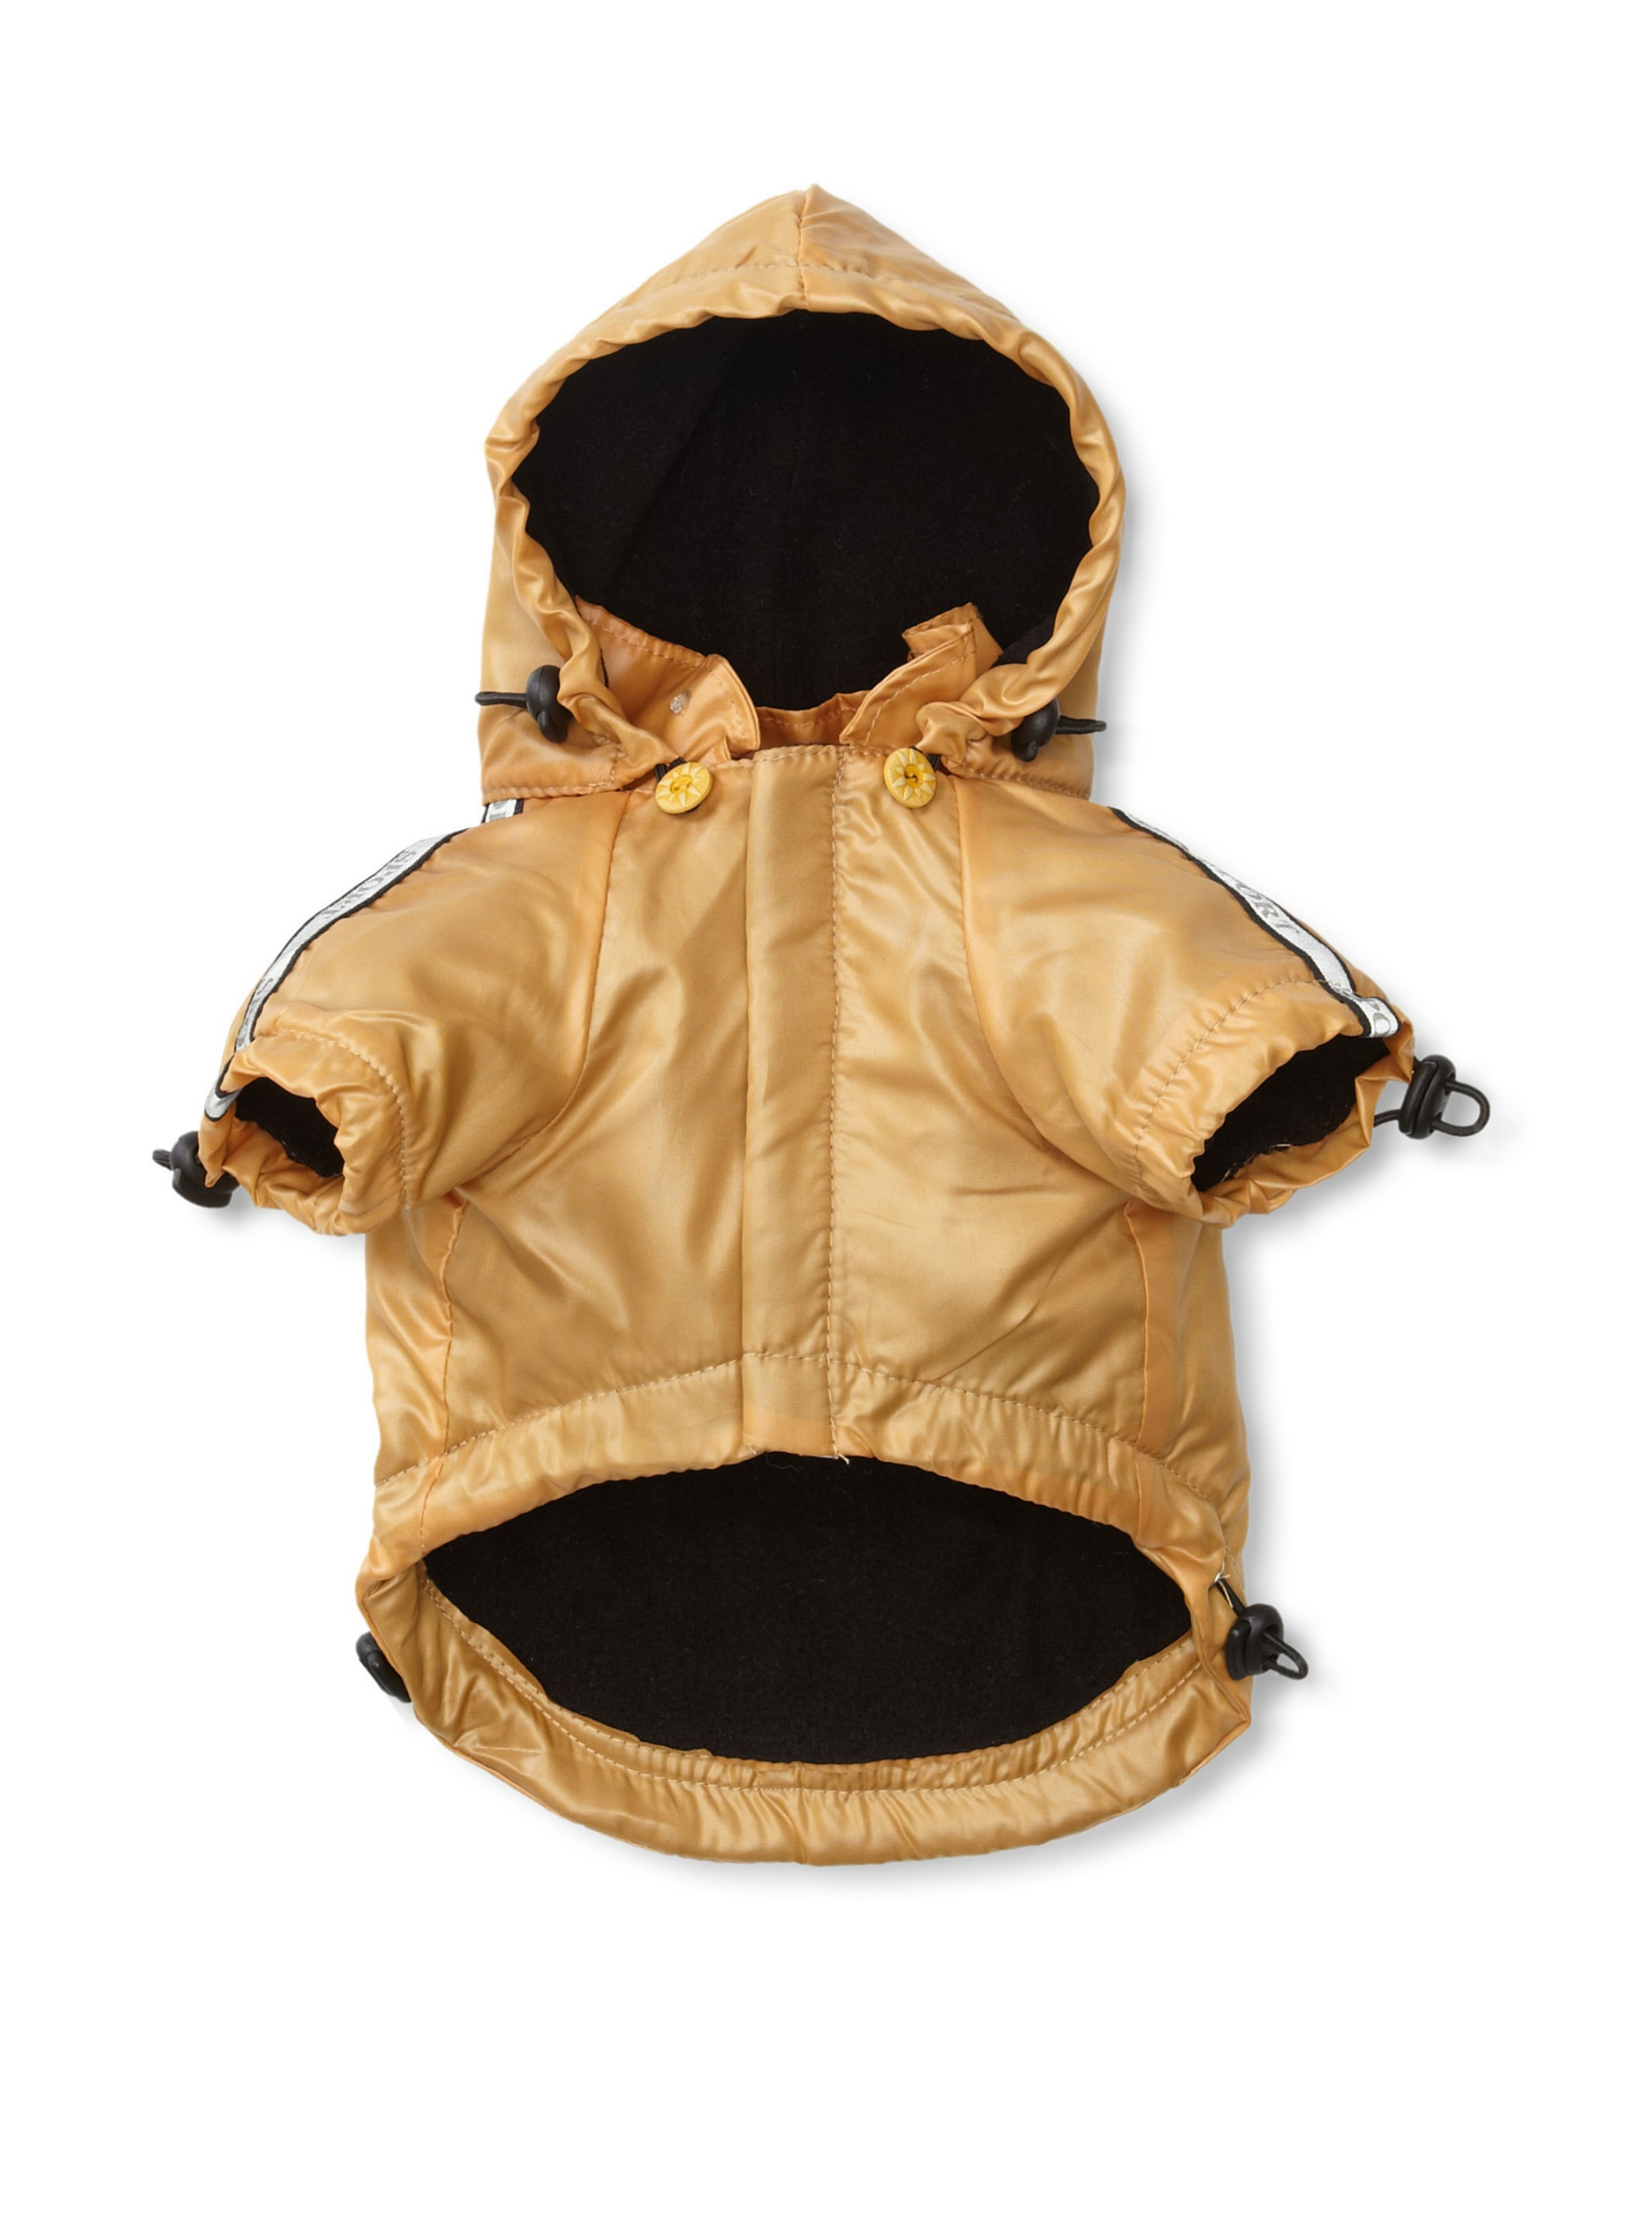 Pet Life Reflecta-Sport Rain Jacket and Windbreaker (Sporty Yellow)